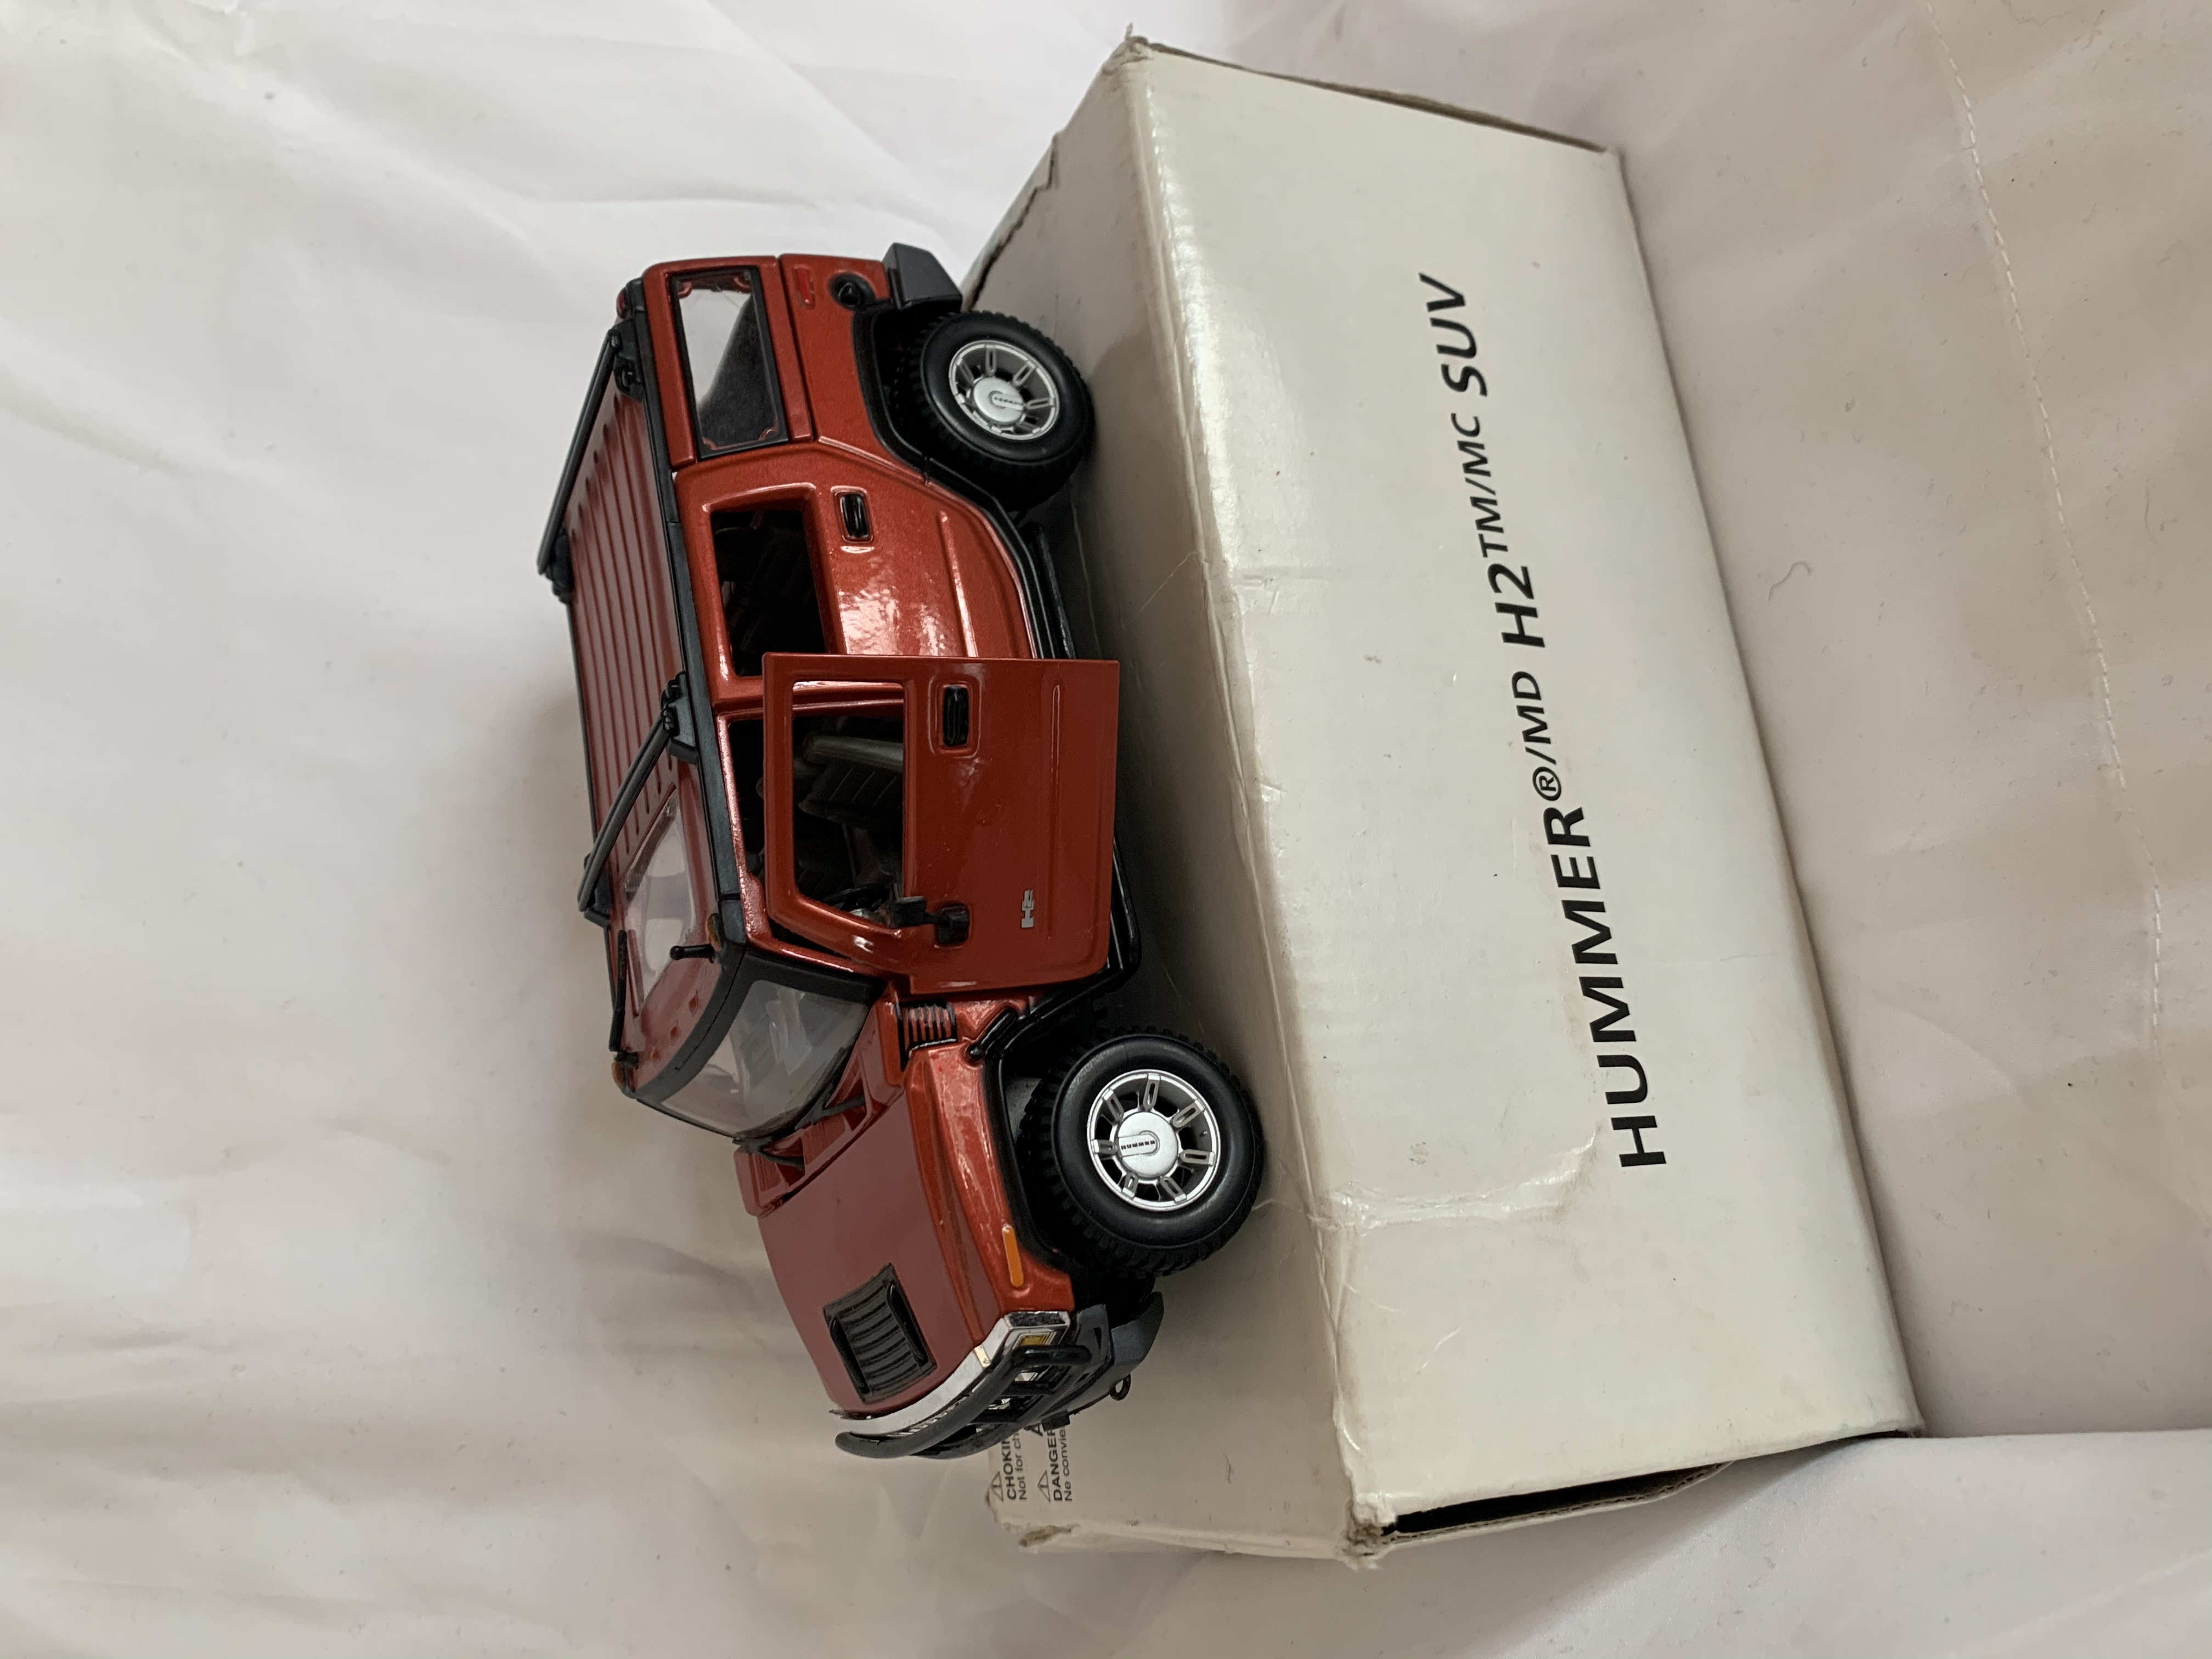 2003 Hummer H2 Diecast Model